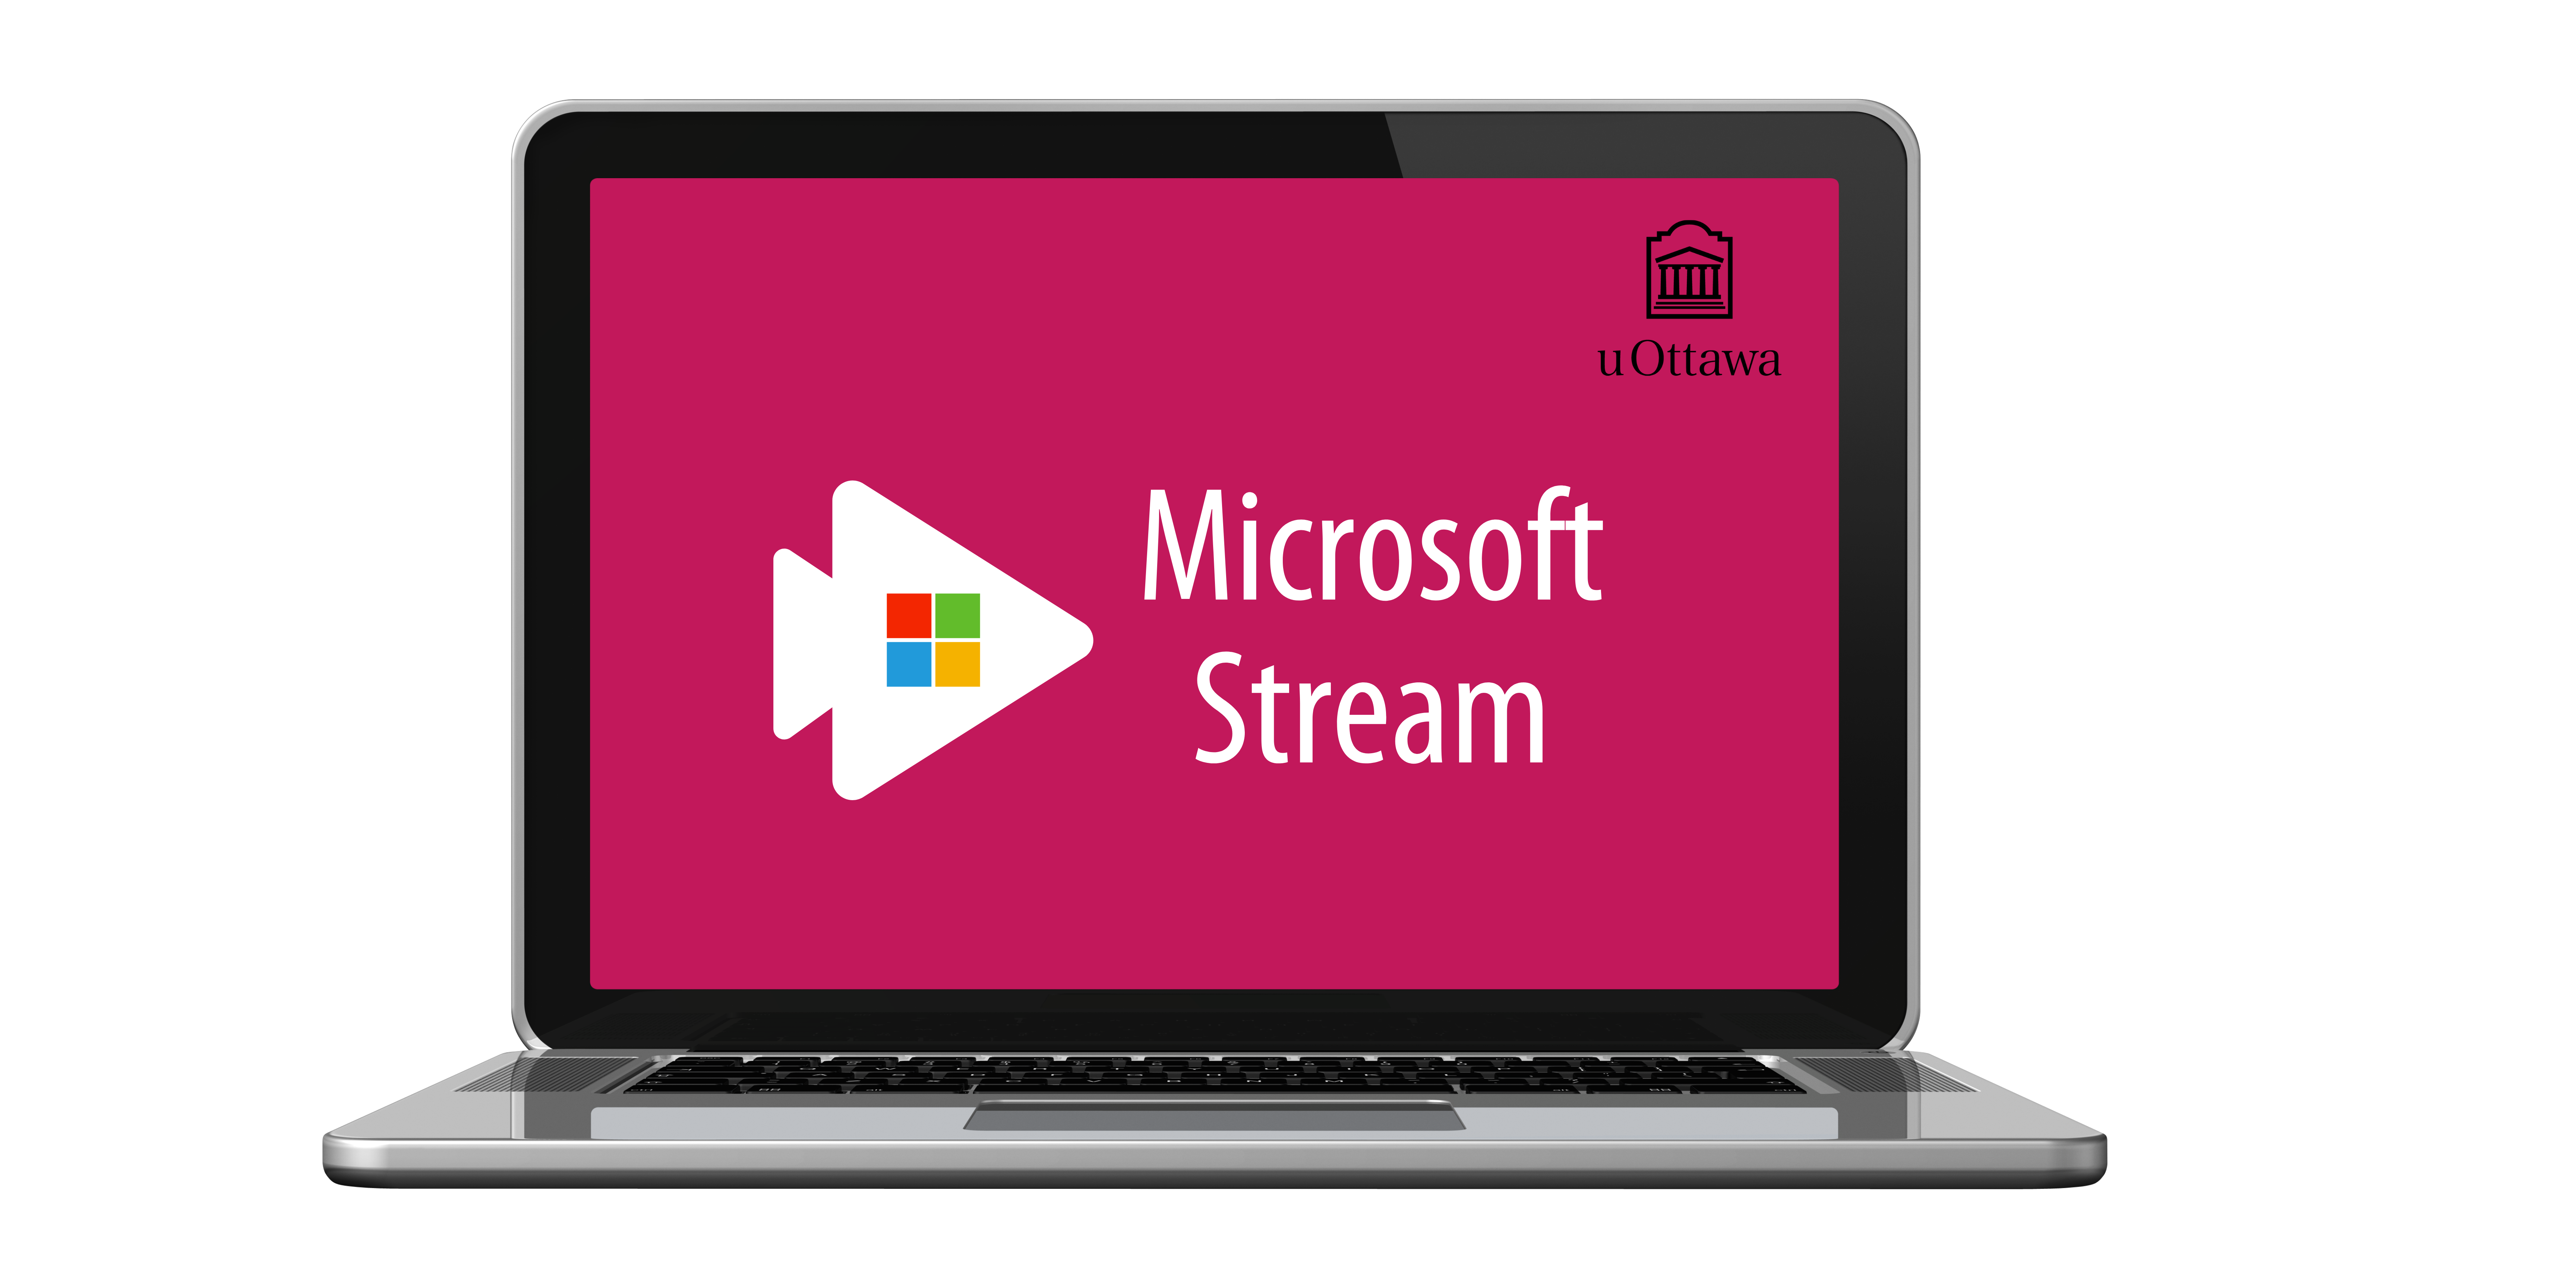 Microsoft Stream Image